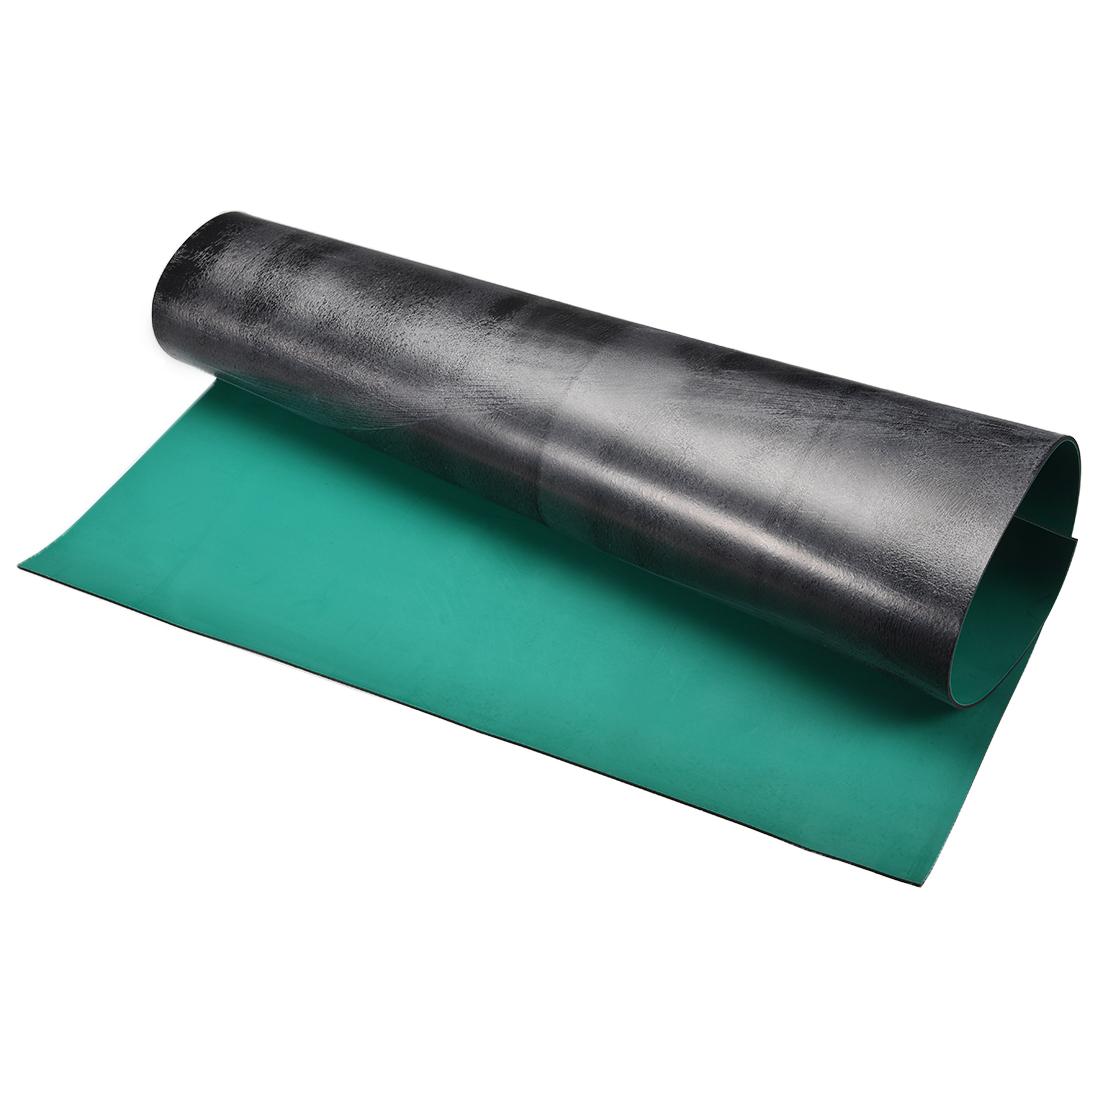 Anti Static ESD Mat High Temperature Rubber Table Mat 1000 x 1000mm Green Black